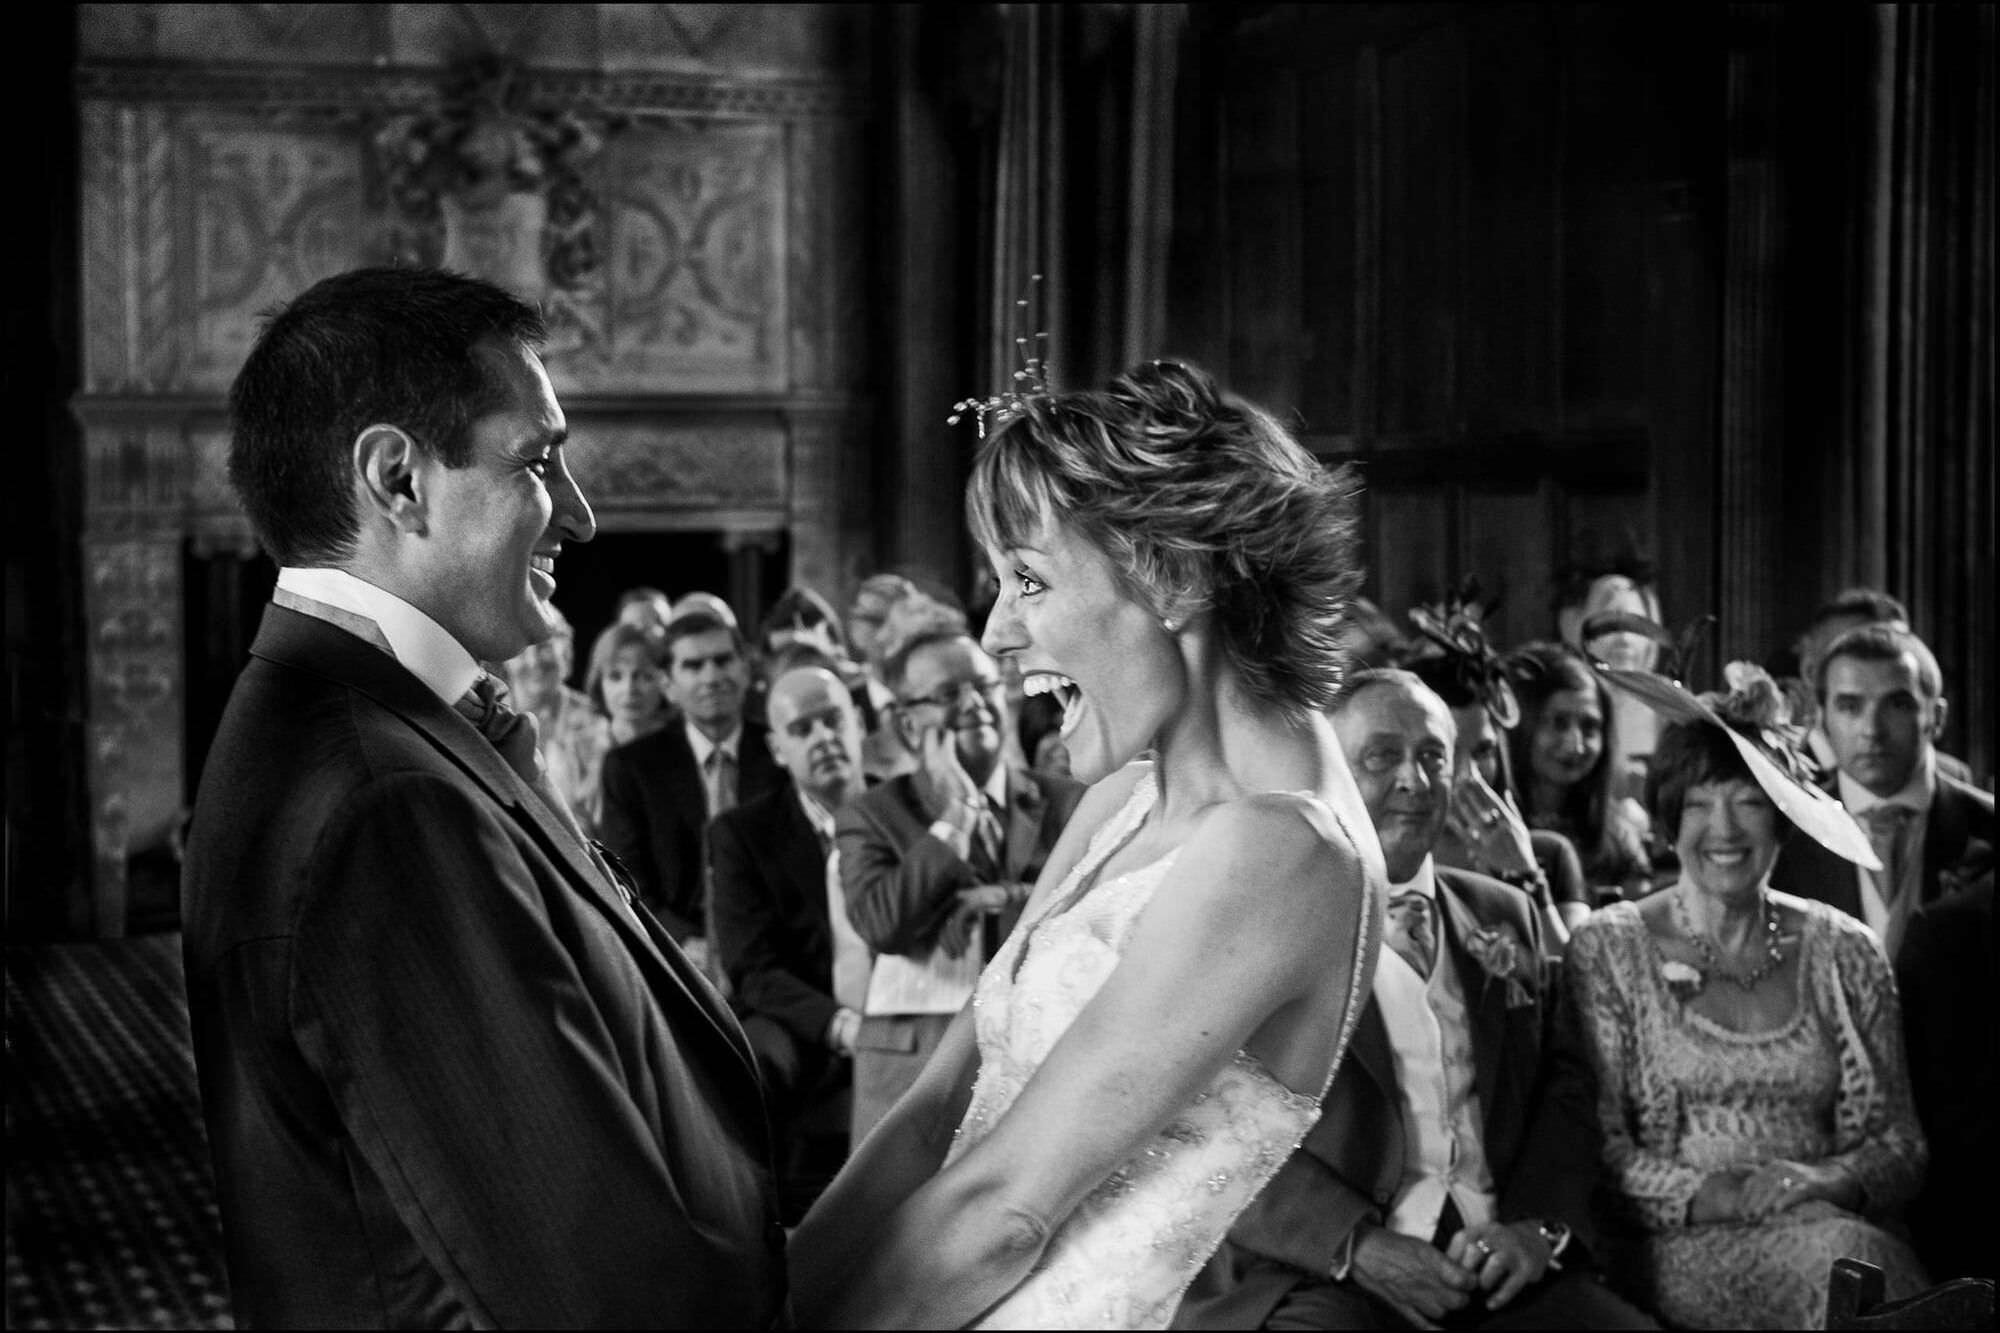 Mark-Seymour-Wedding-Photographer-UK-01 15